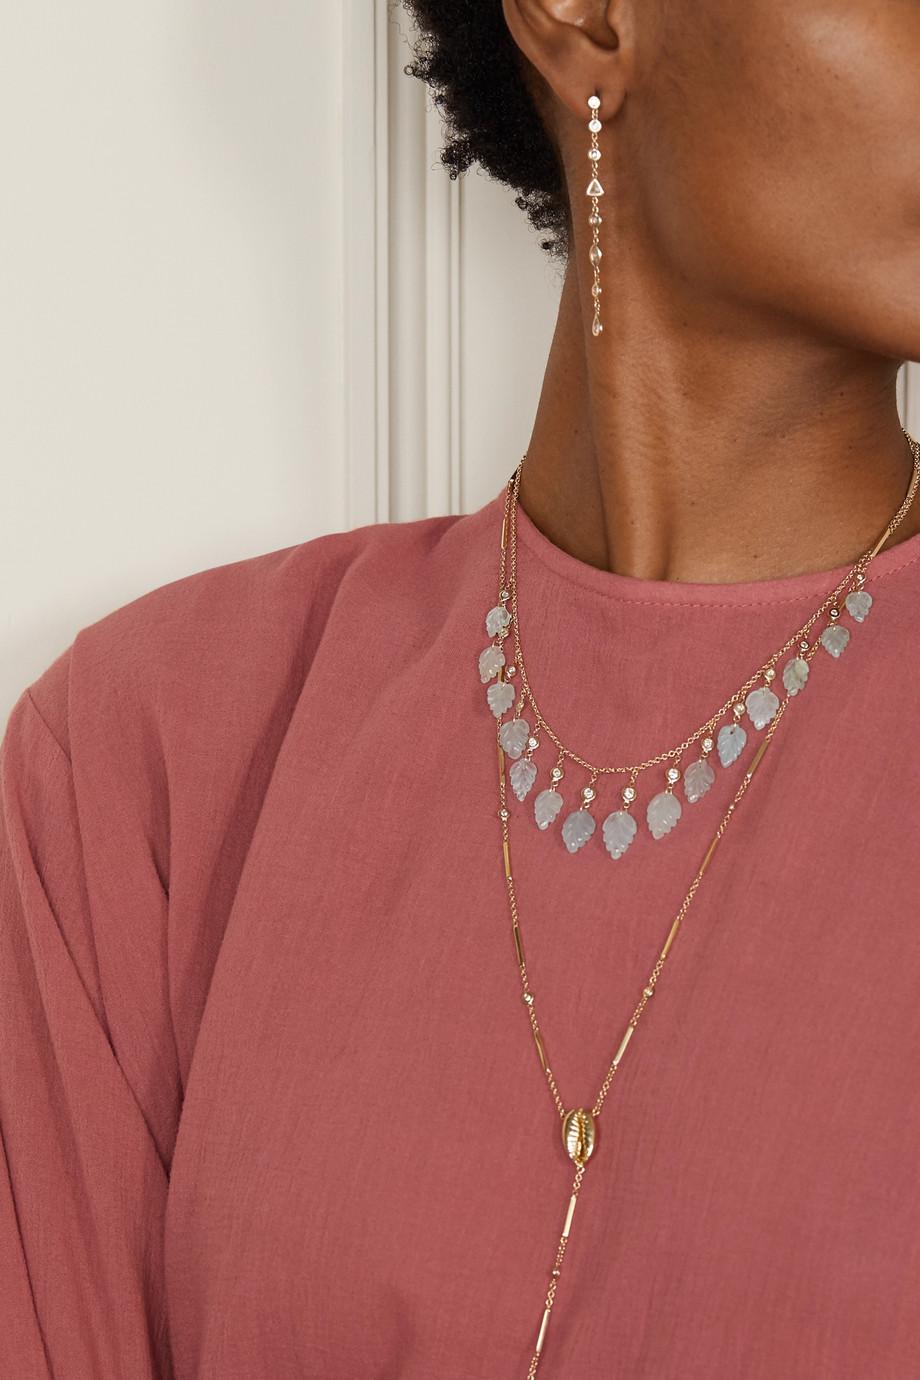 Jacquie Aiche 14-karat gold, aquamarine and diamond necklace